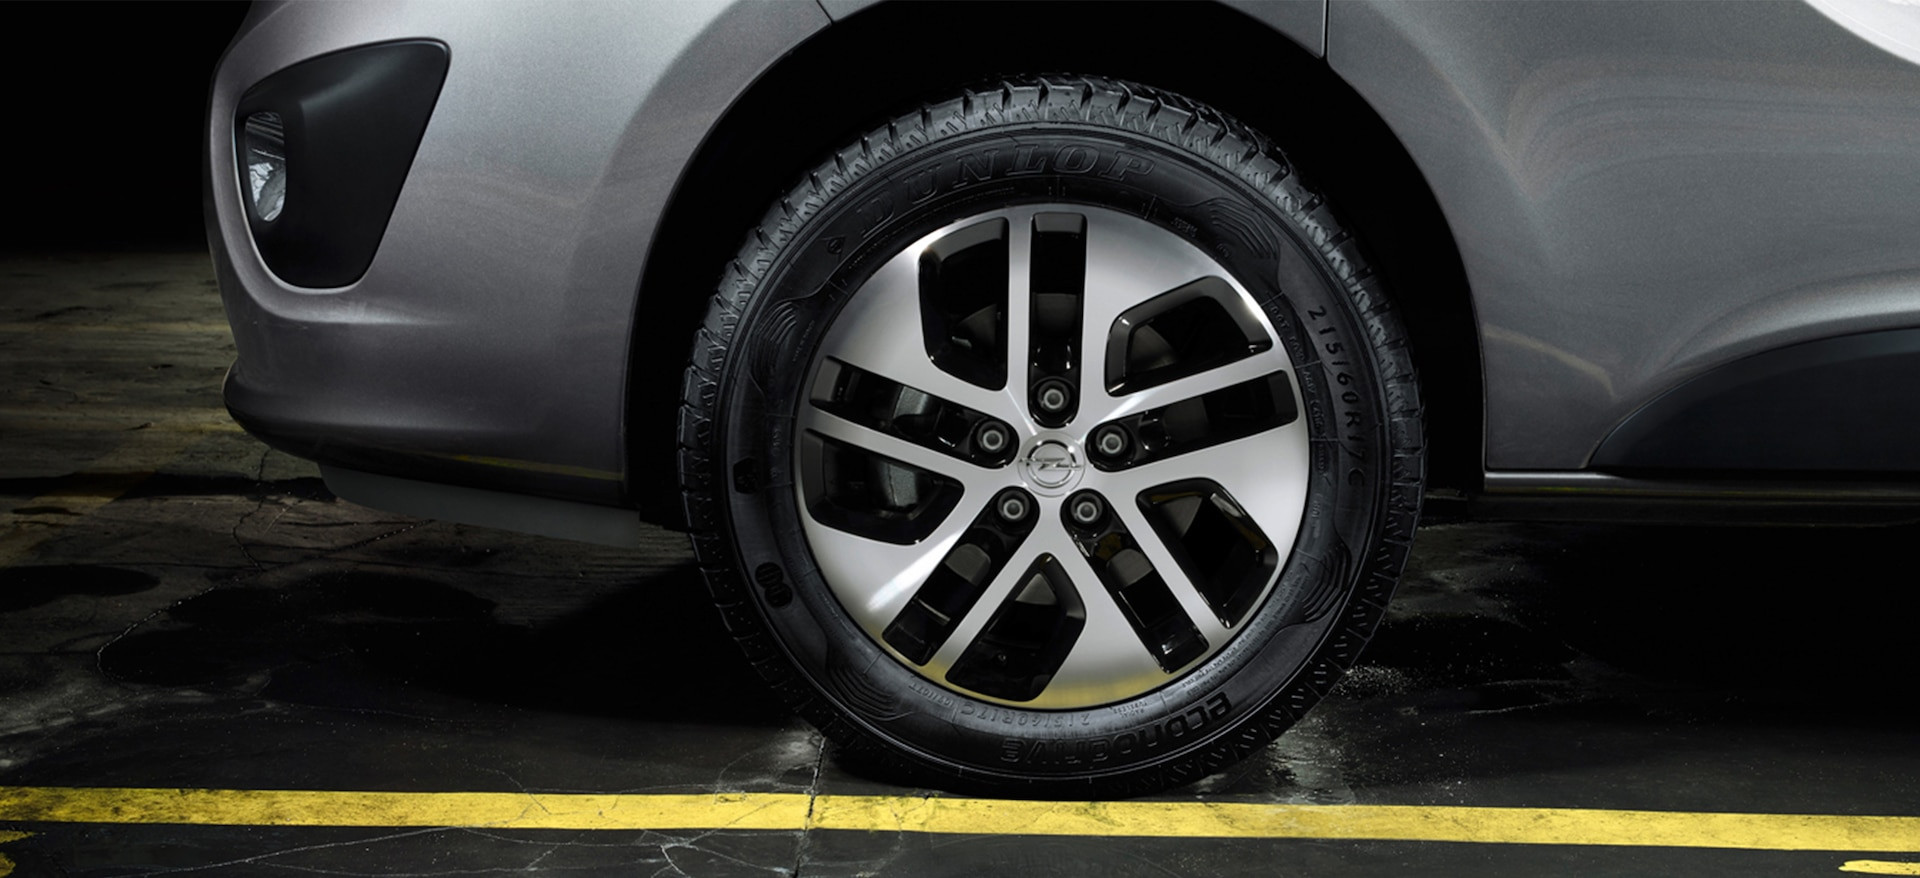 Opel_Vivaro_Tourer_Wheels_21x9_vip18_w01